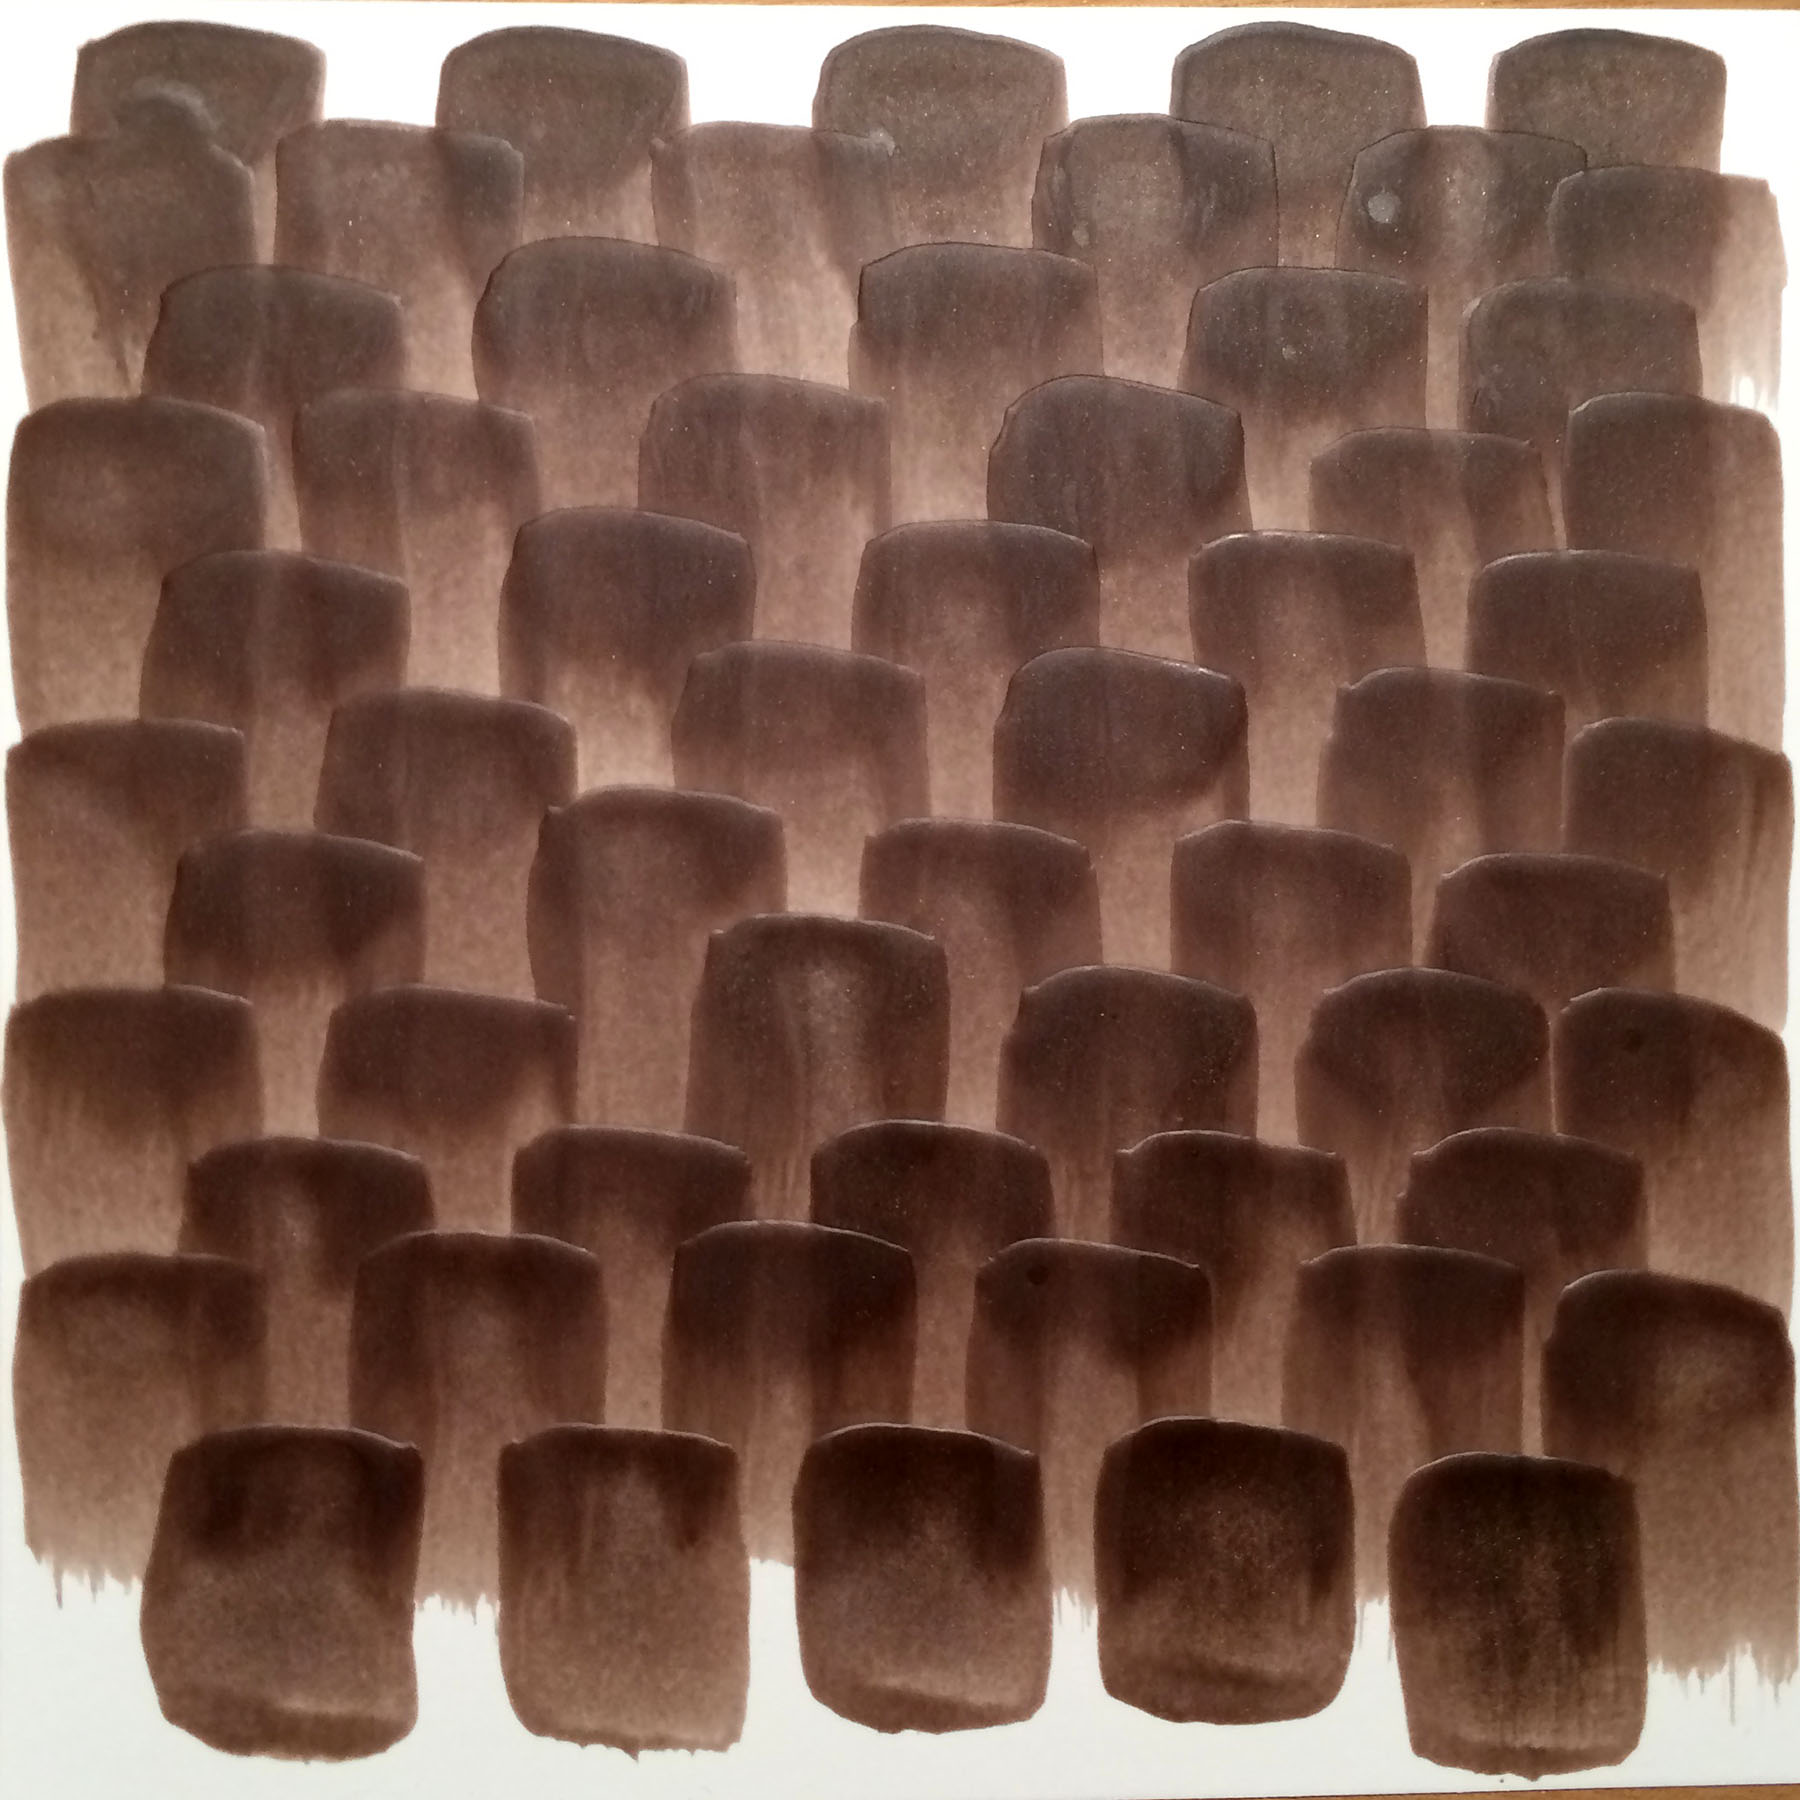 "Walnut Bark, 2016, Encaustic on paper, 6"" x 6"""